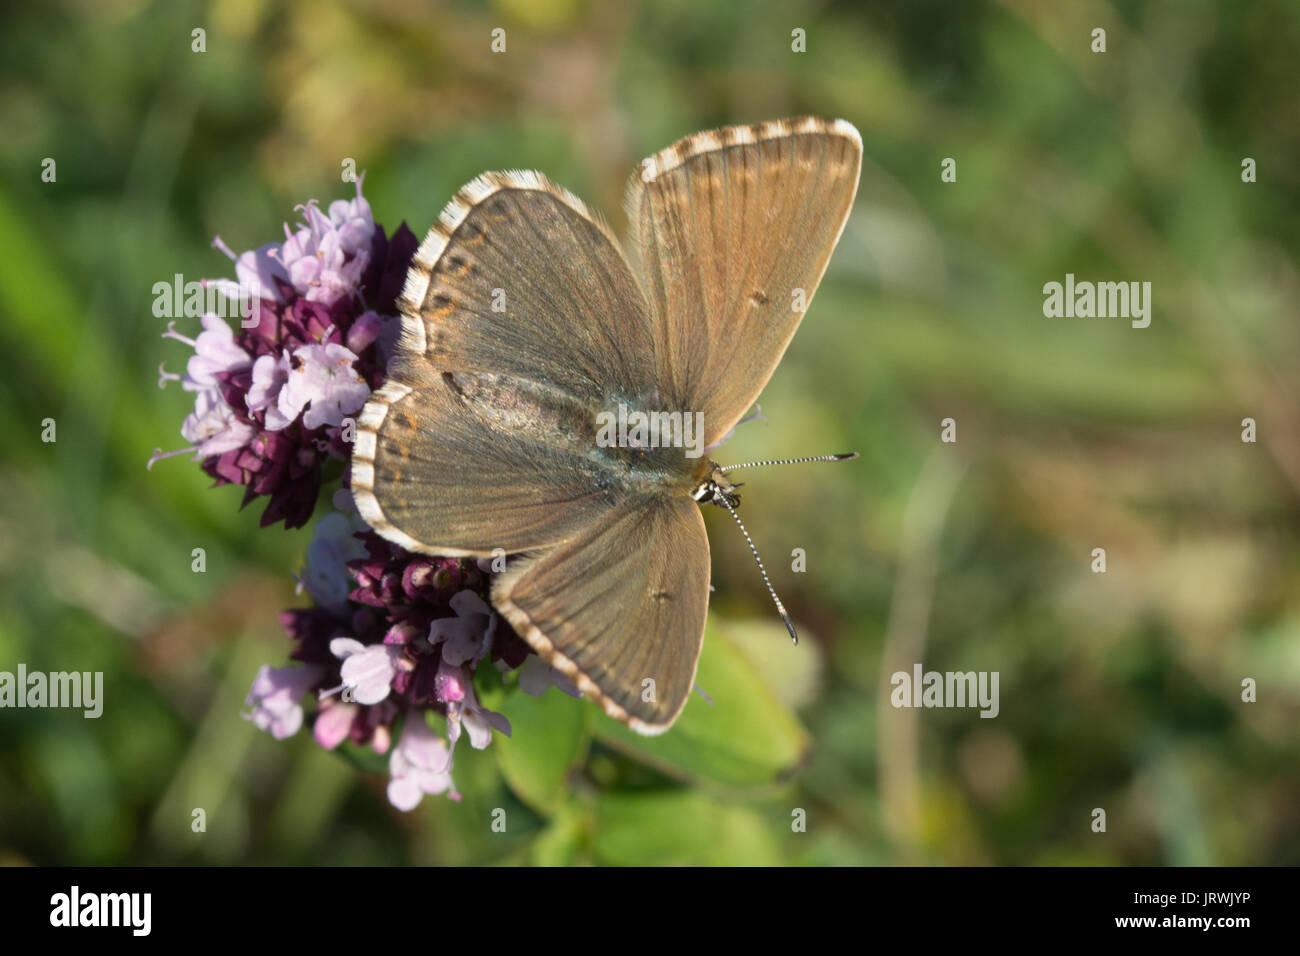 Chalkhill blue butterfly (Polyommatus coridon) on wildflowers at Stockbridge Down in Hampshire, UK Stock Photo